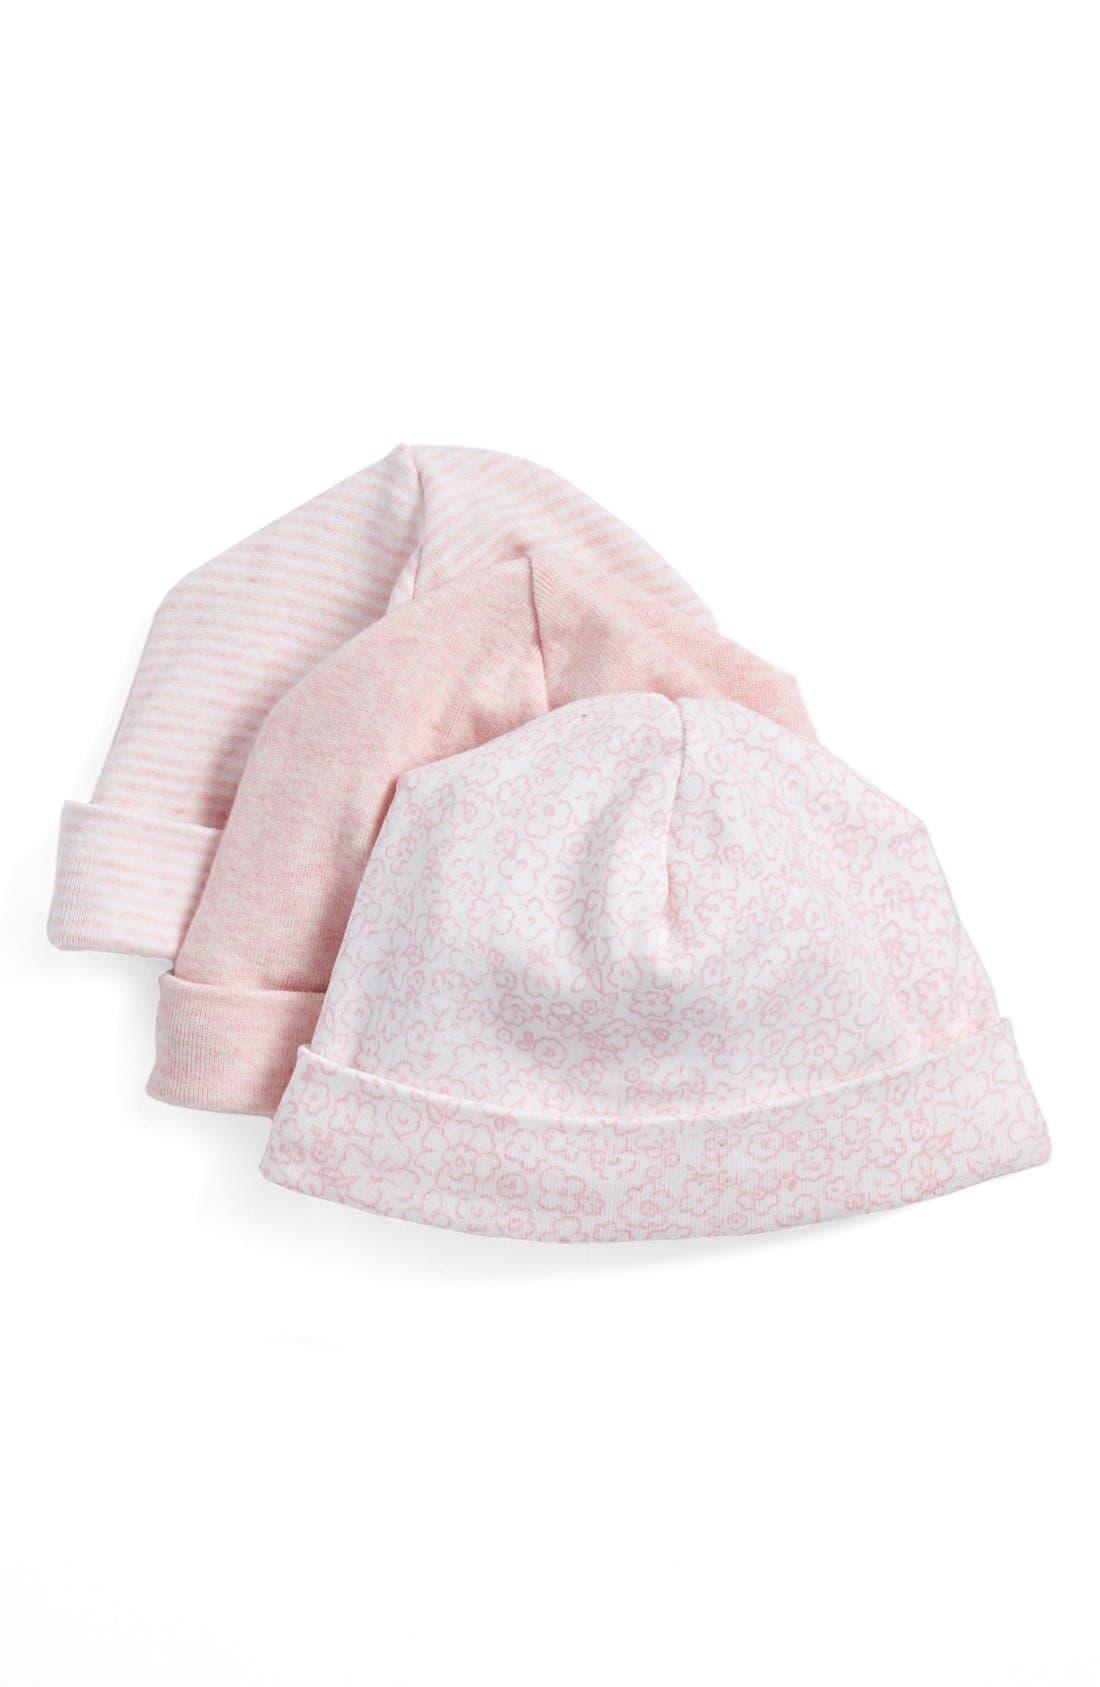 NORDSTROM BABY Beanie Hats